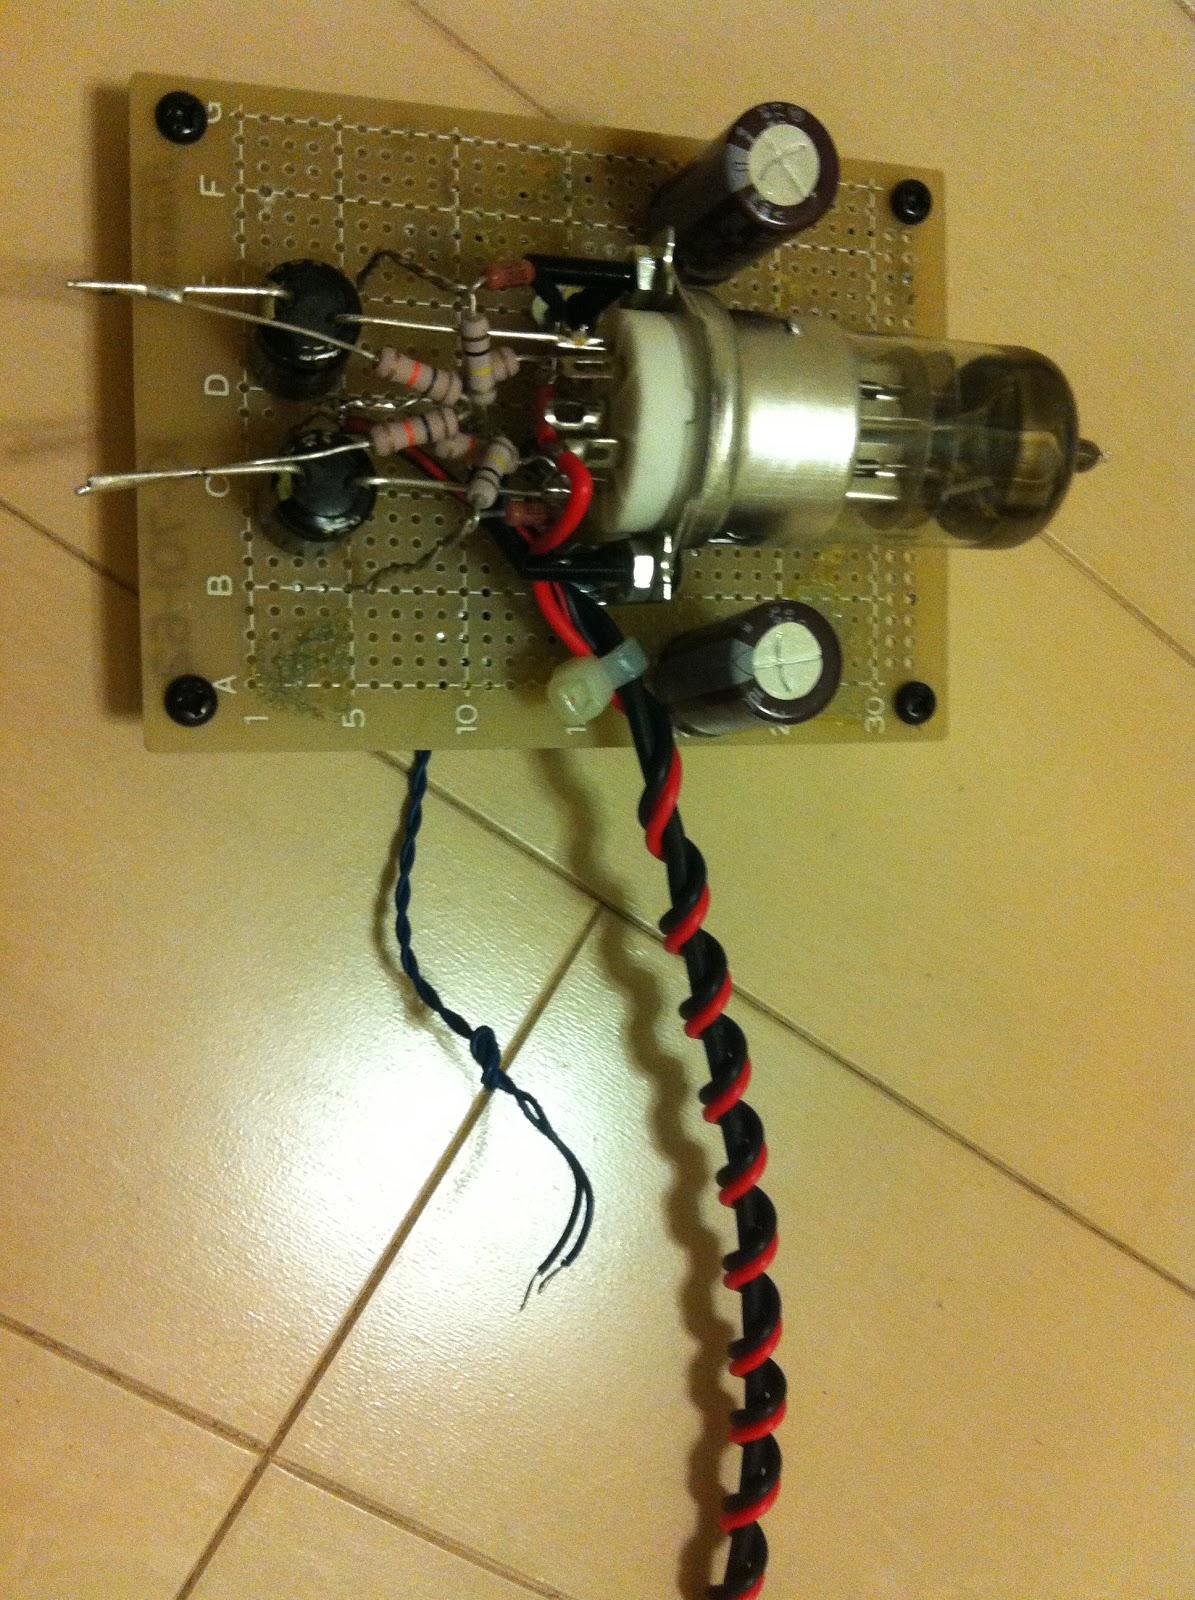 Low Voltage Tube Buffer Computere Elektro Lowjadi Circuit Schematic Diagram Heater Pake Dc Supply Sementara Ngikut Gc